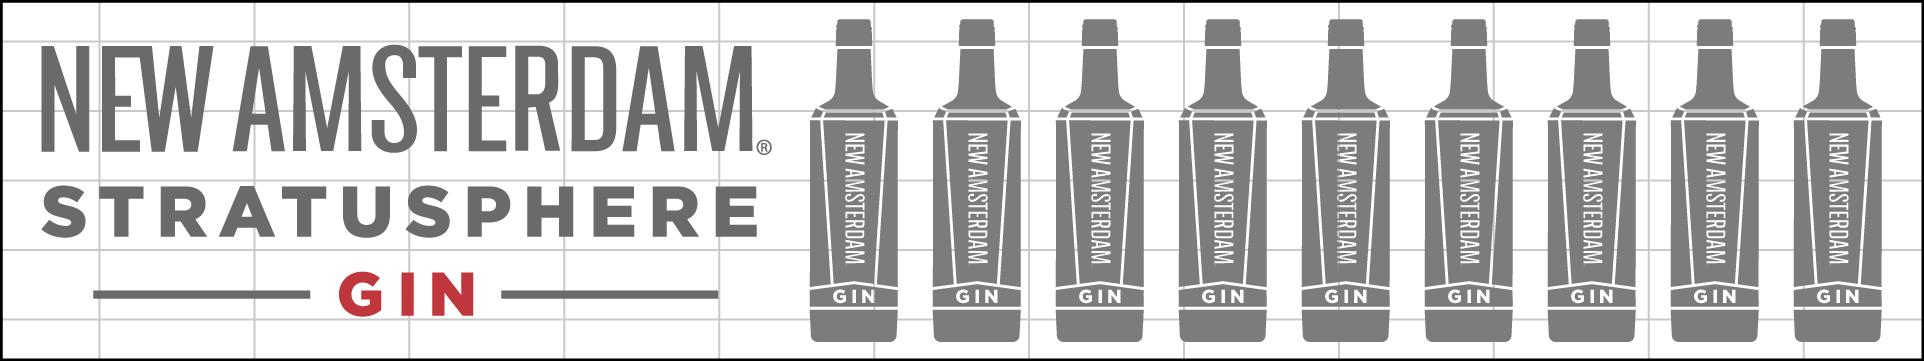 New Amsterdam Stratusphere Gin